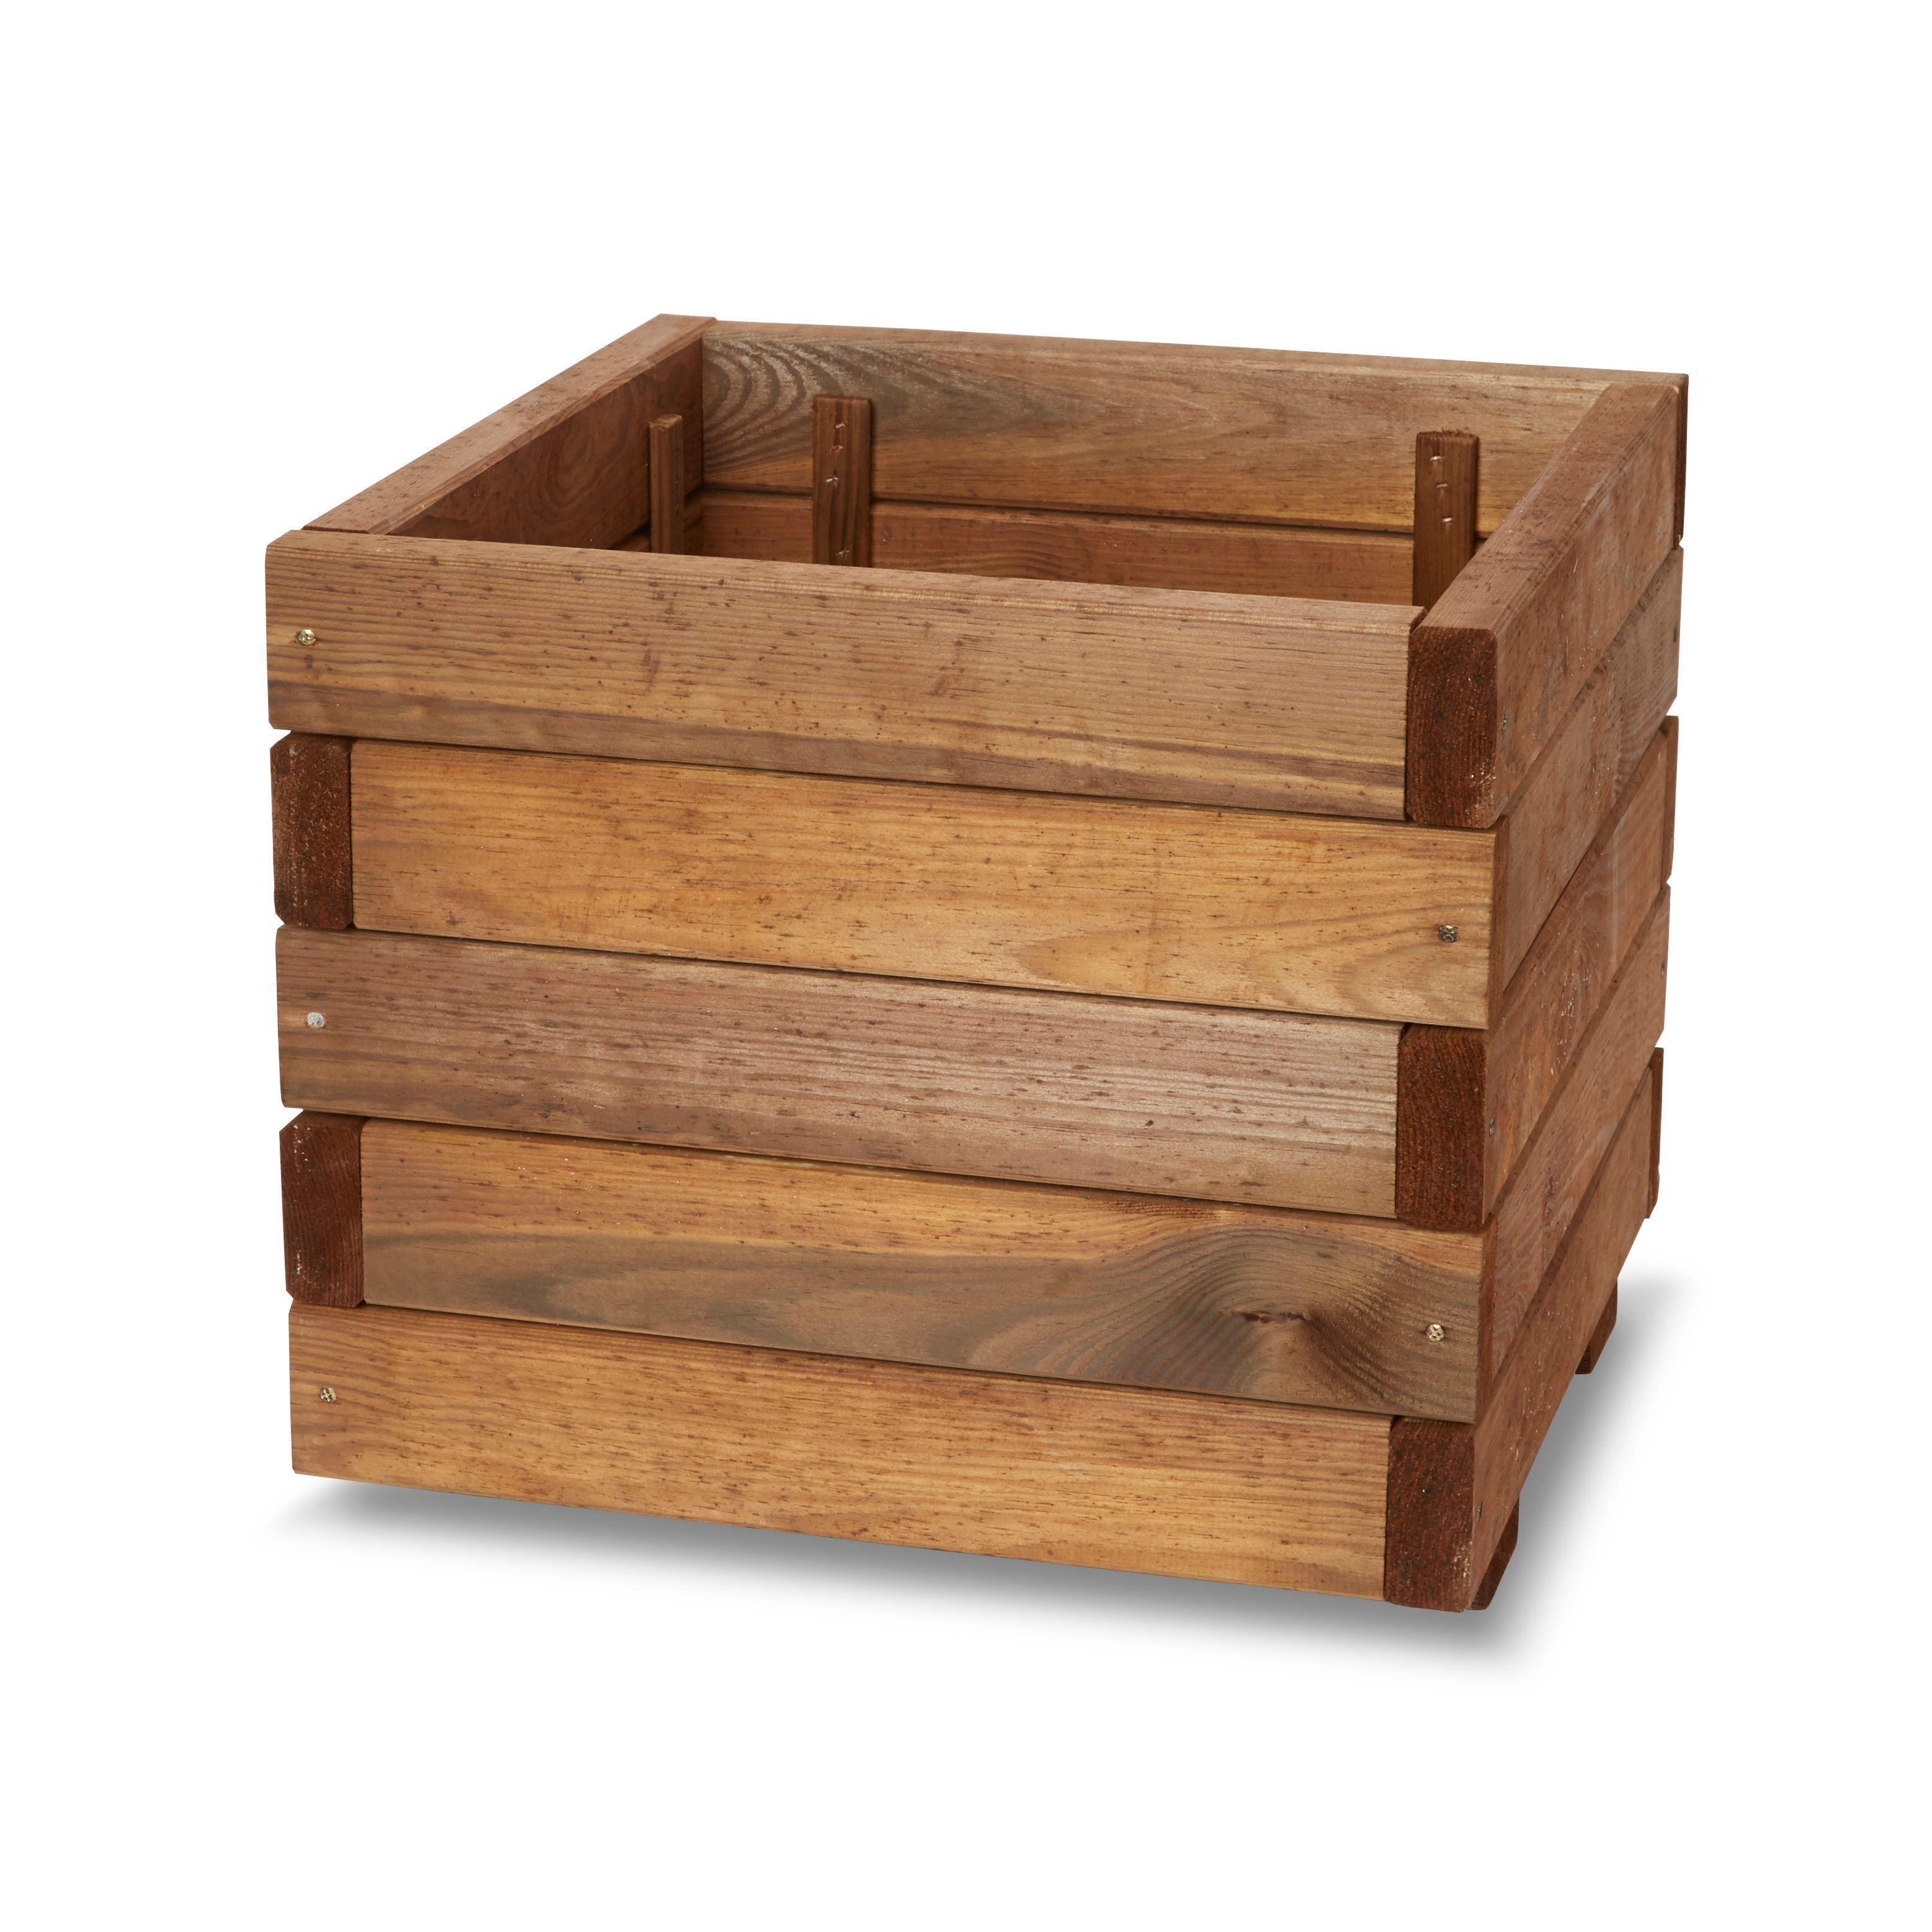 Bopha Square Wooden Planter (H)350mm (Dia)400mm | Wooden planters ...